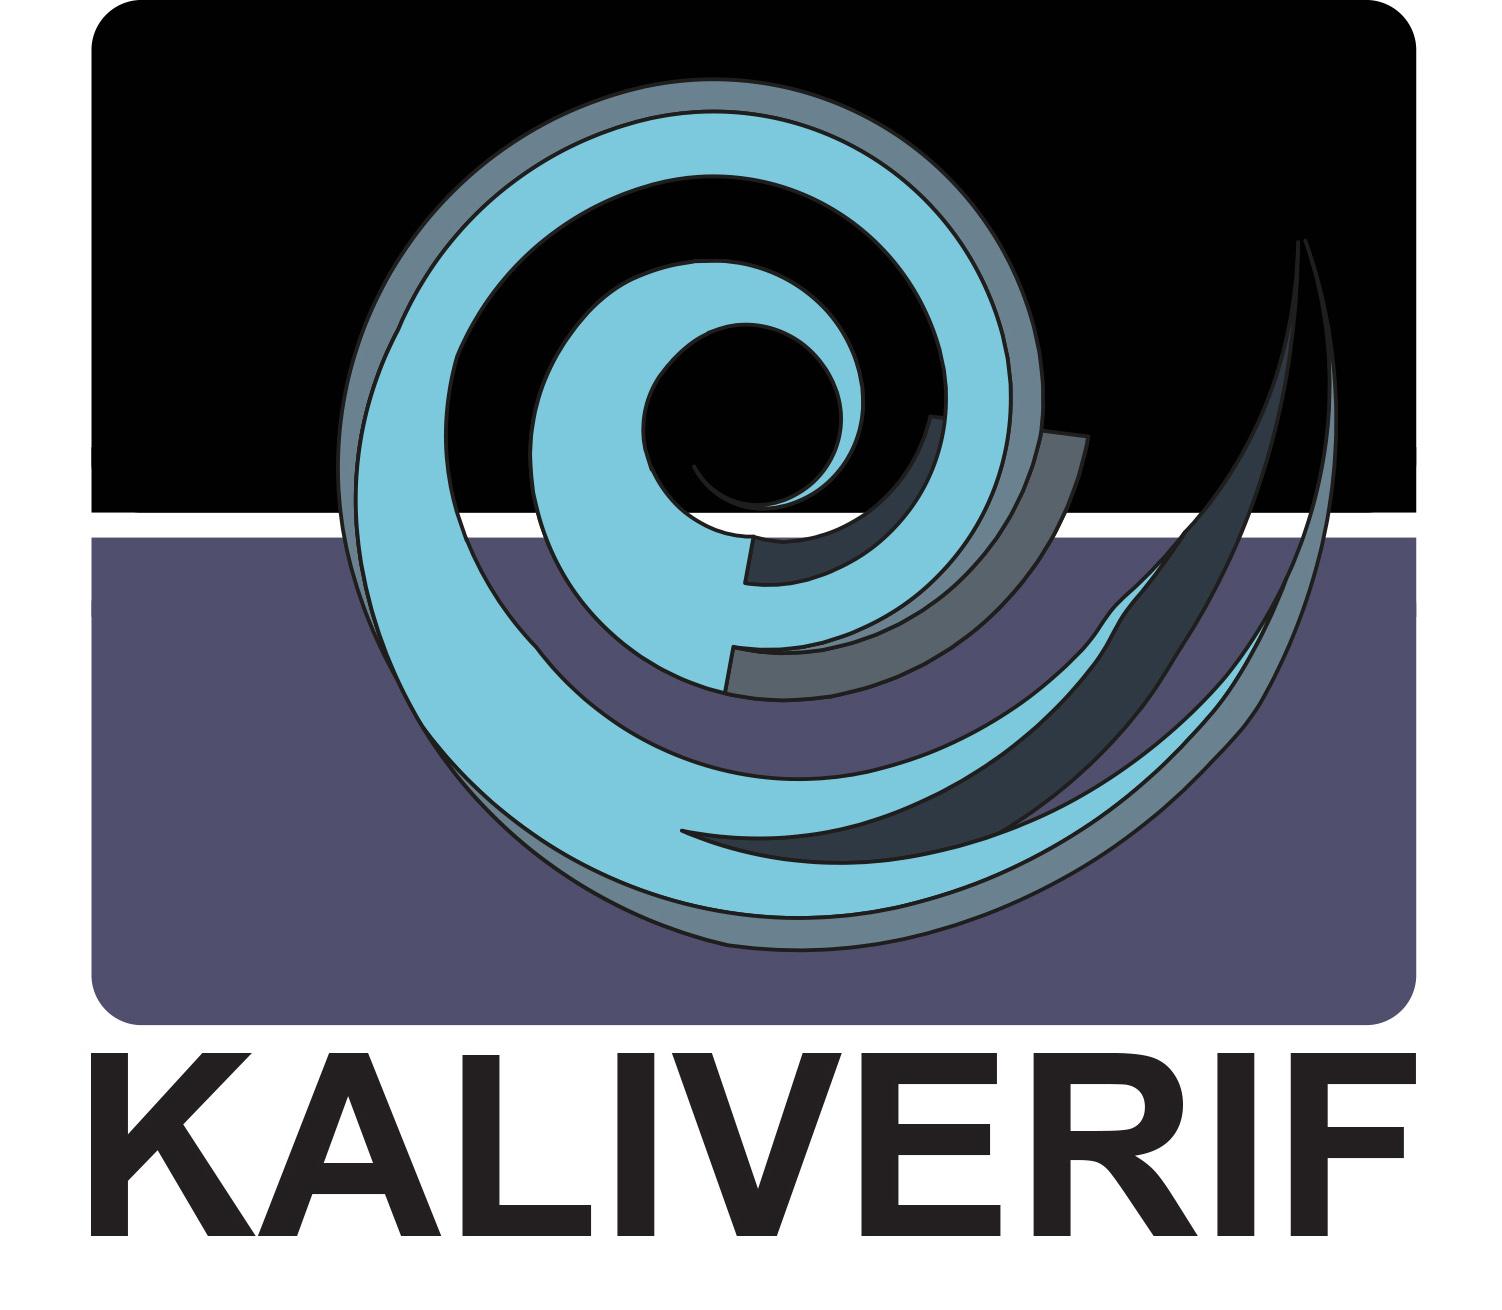 kaliverif rt2012 infiltrometrie etancheite air